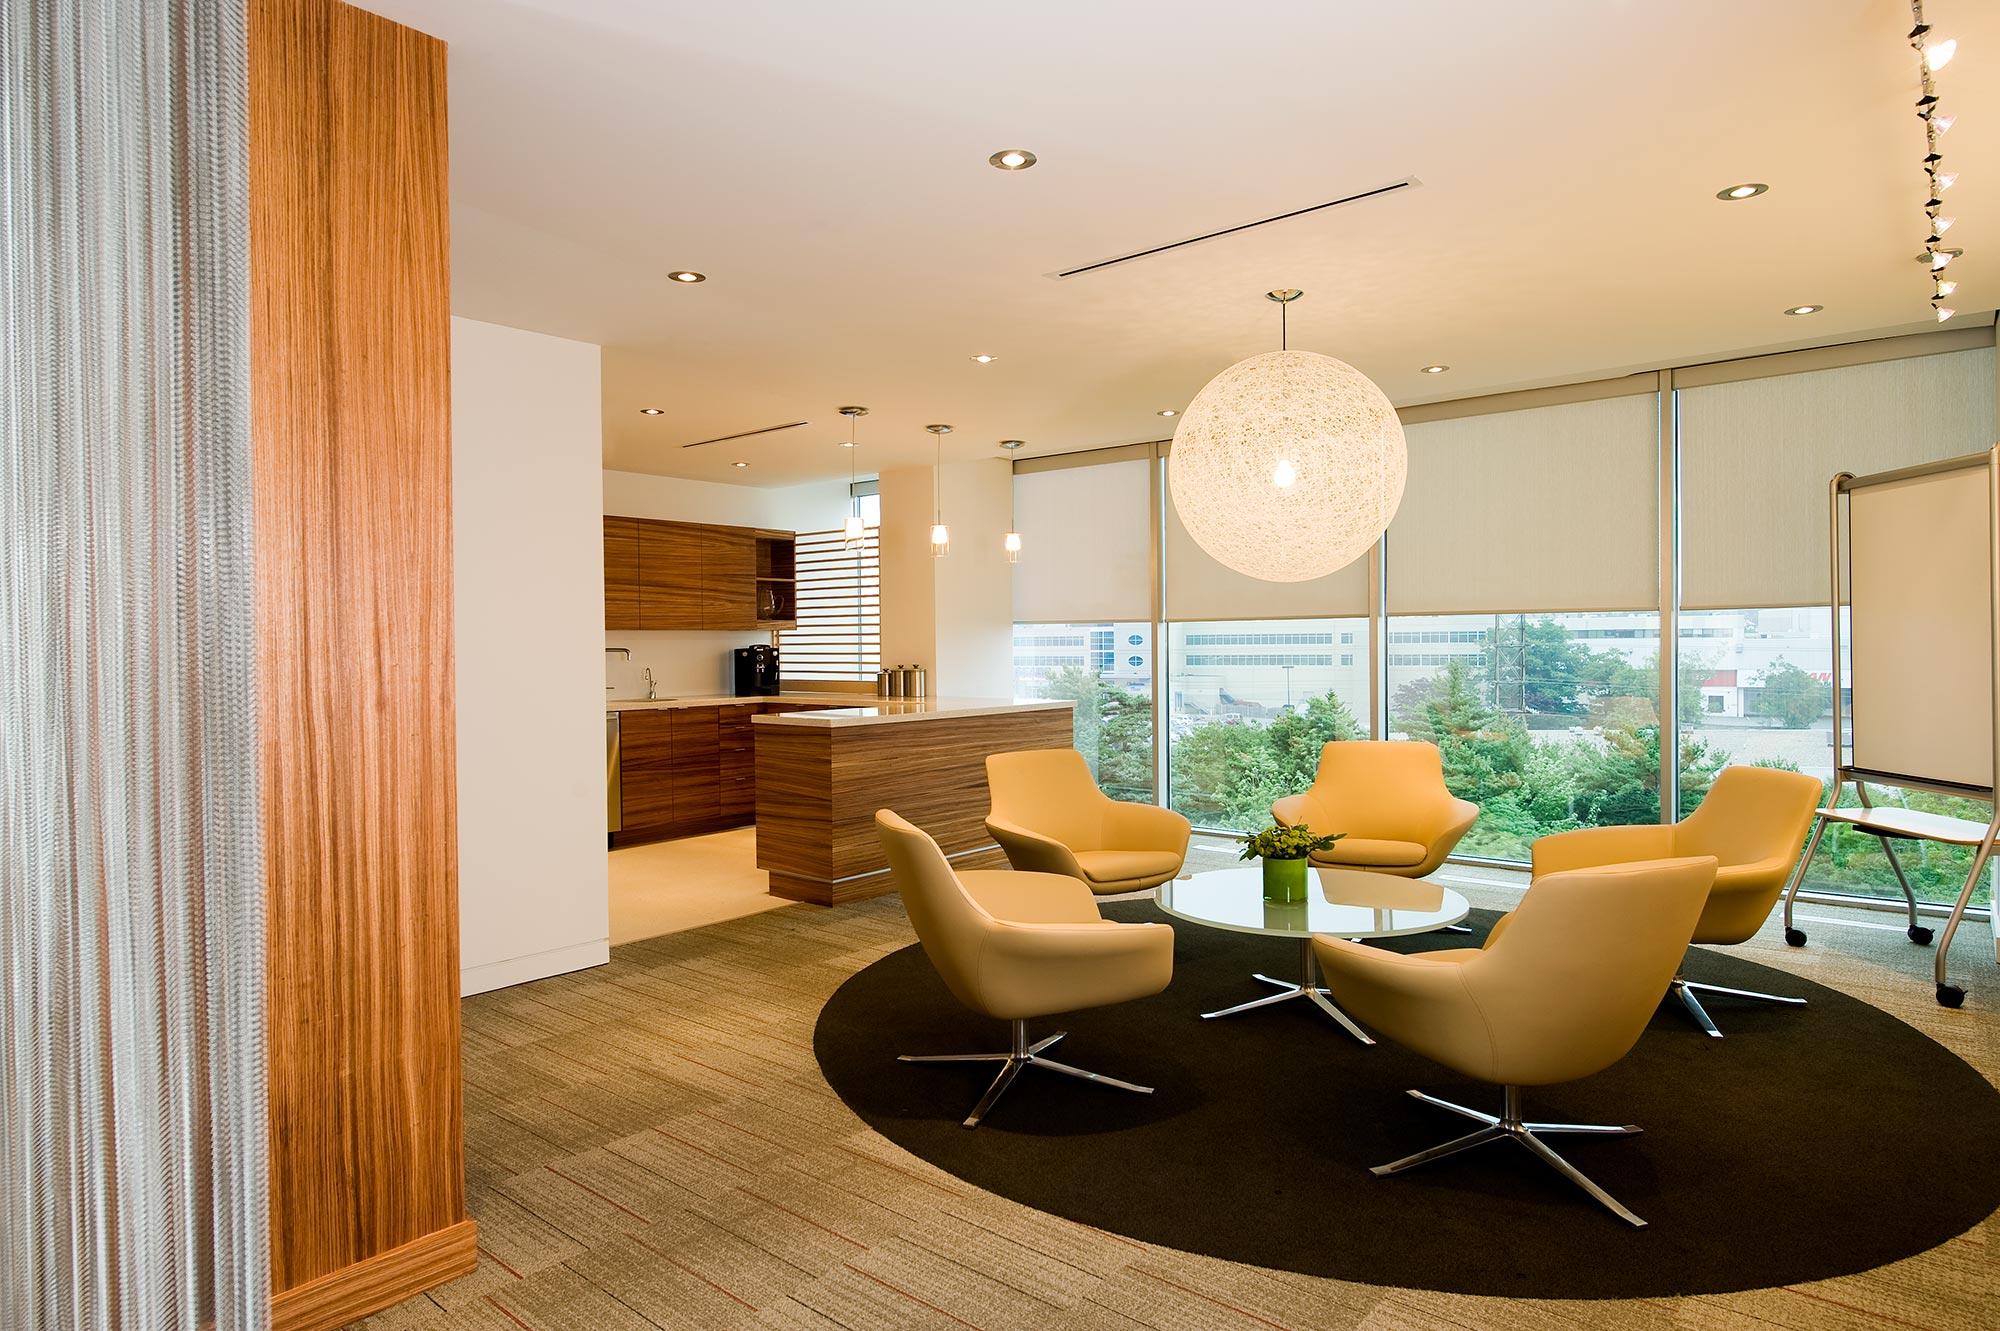 interior-design-media-office-seating-area.jpg